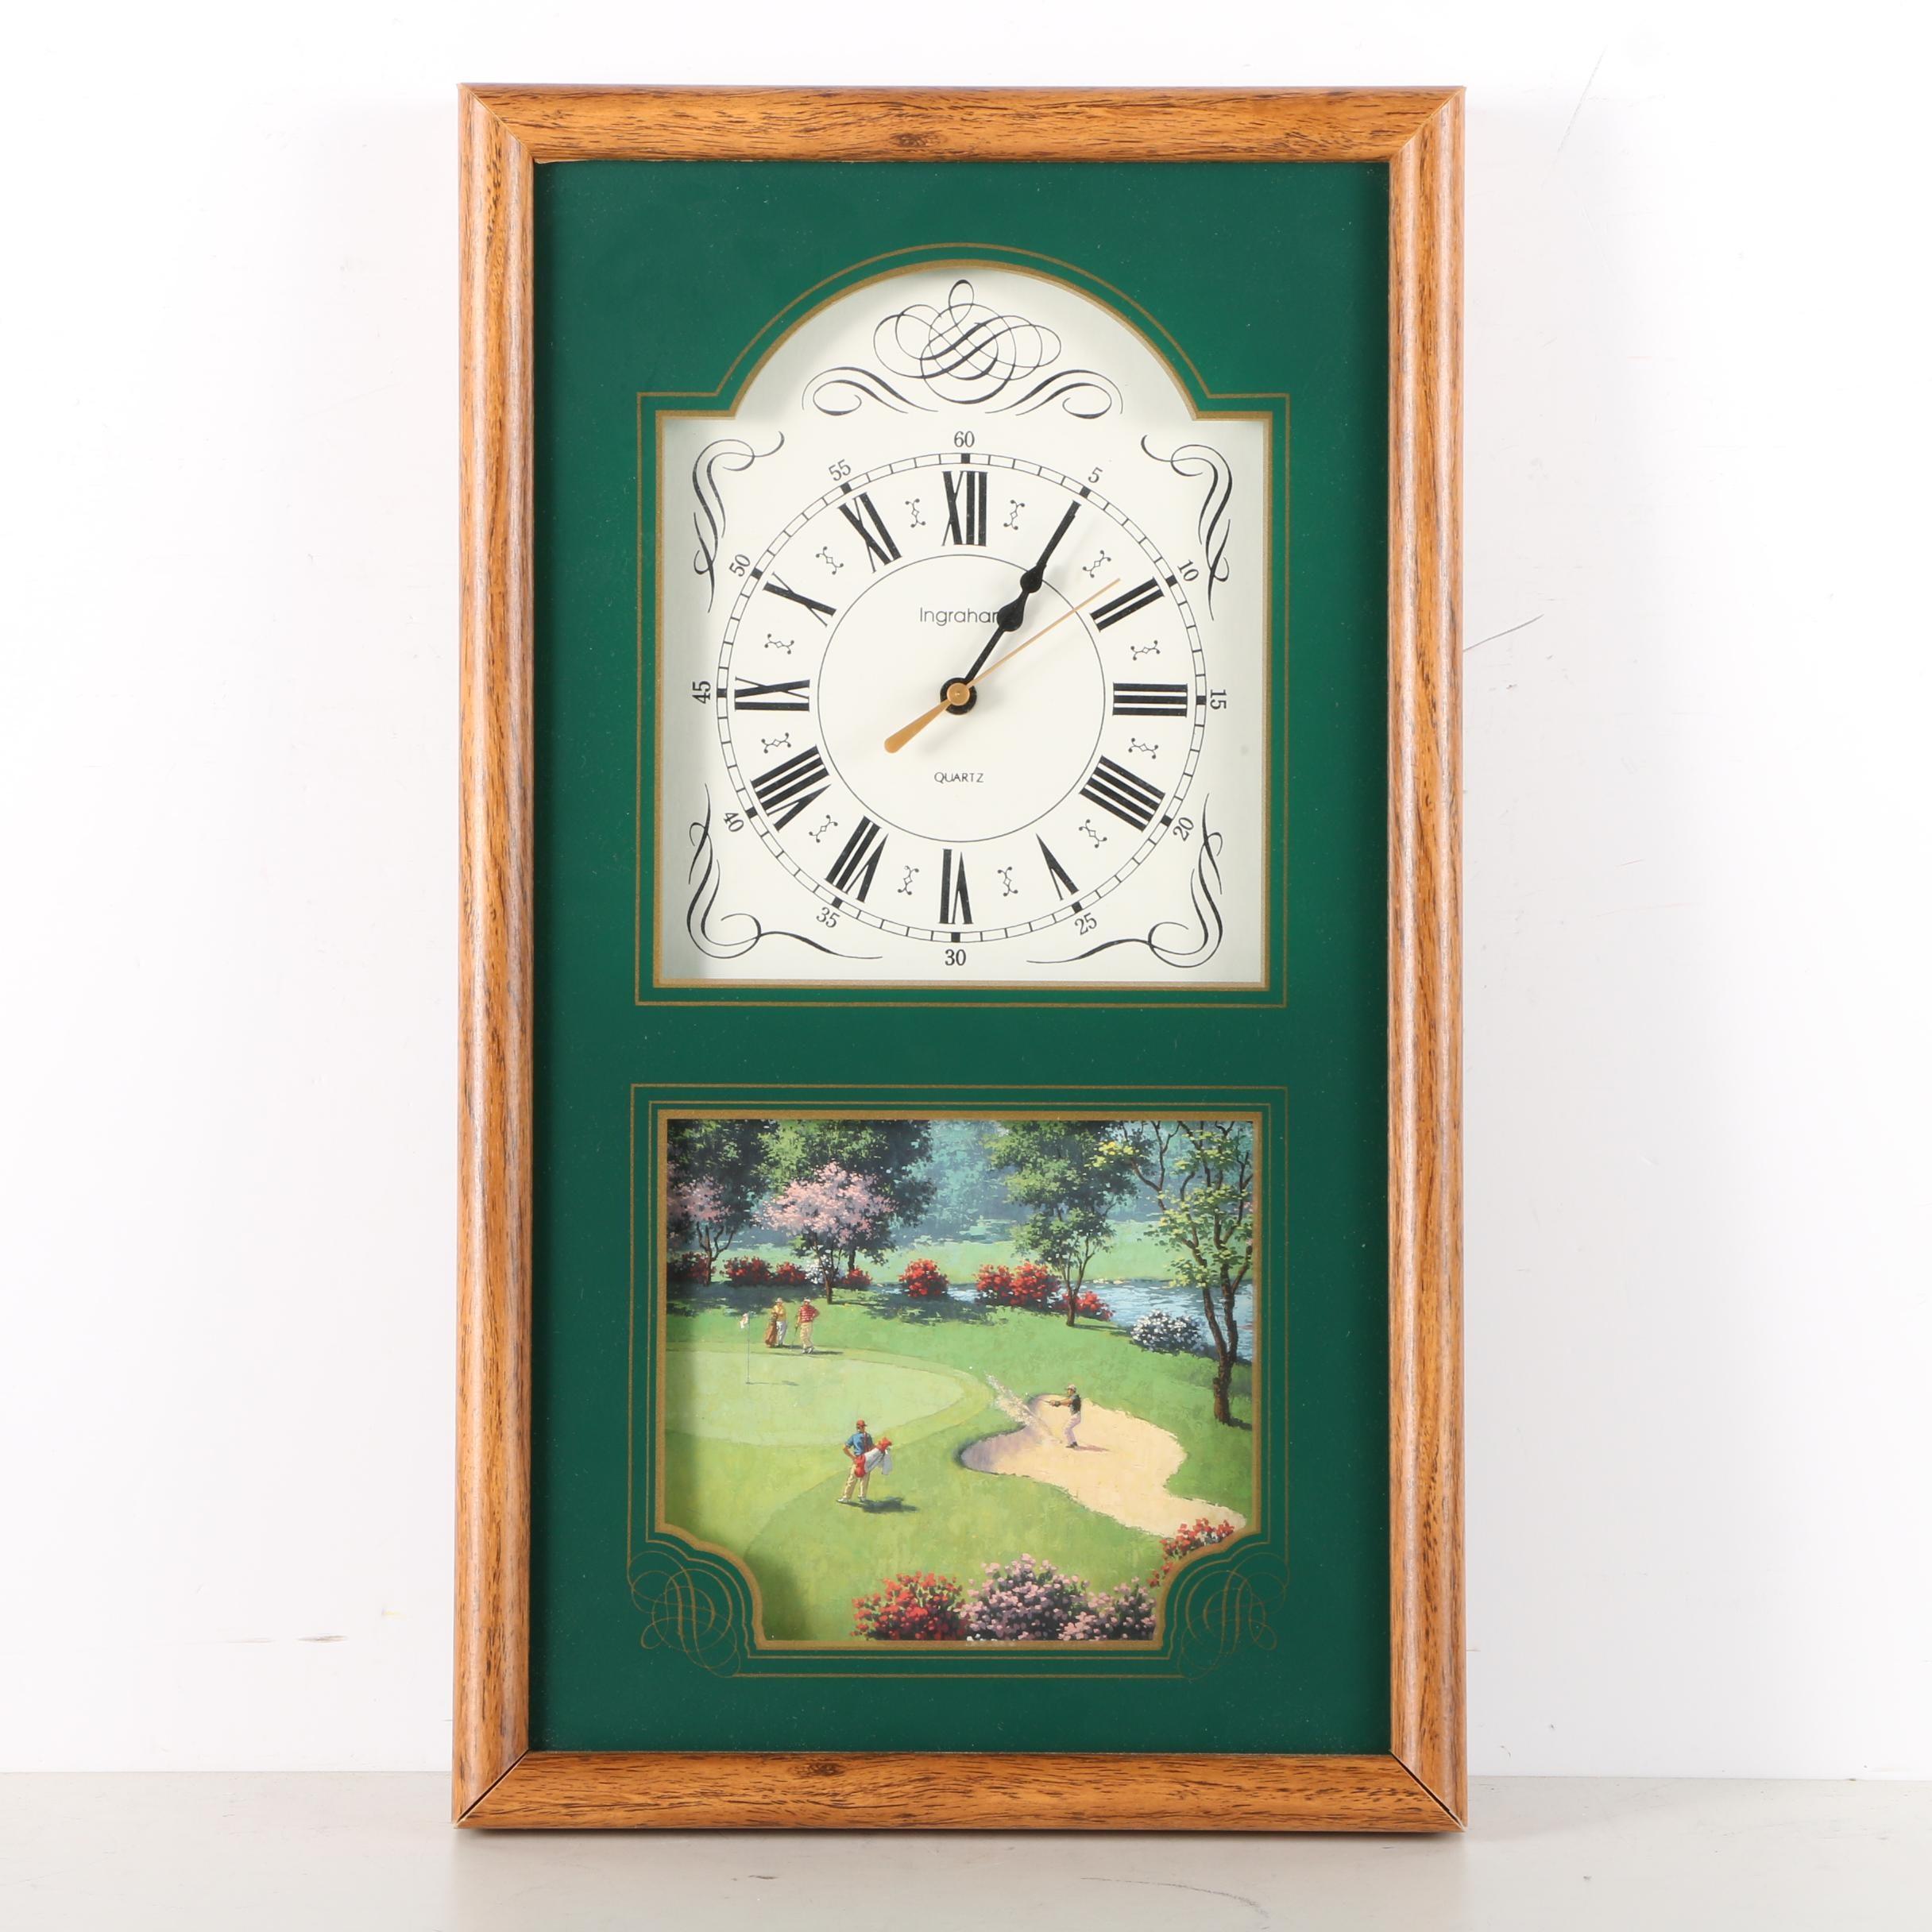 Ingraham Golf-Themed Analog Wall Clock